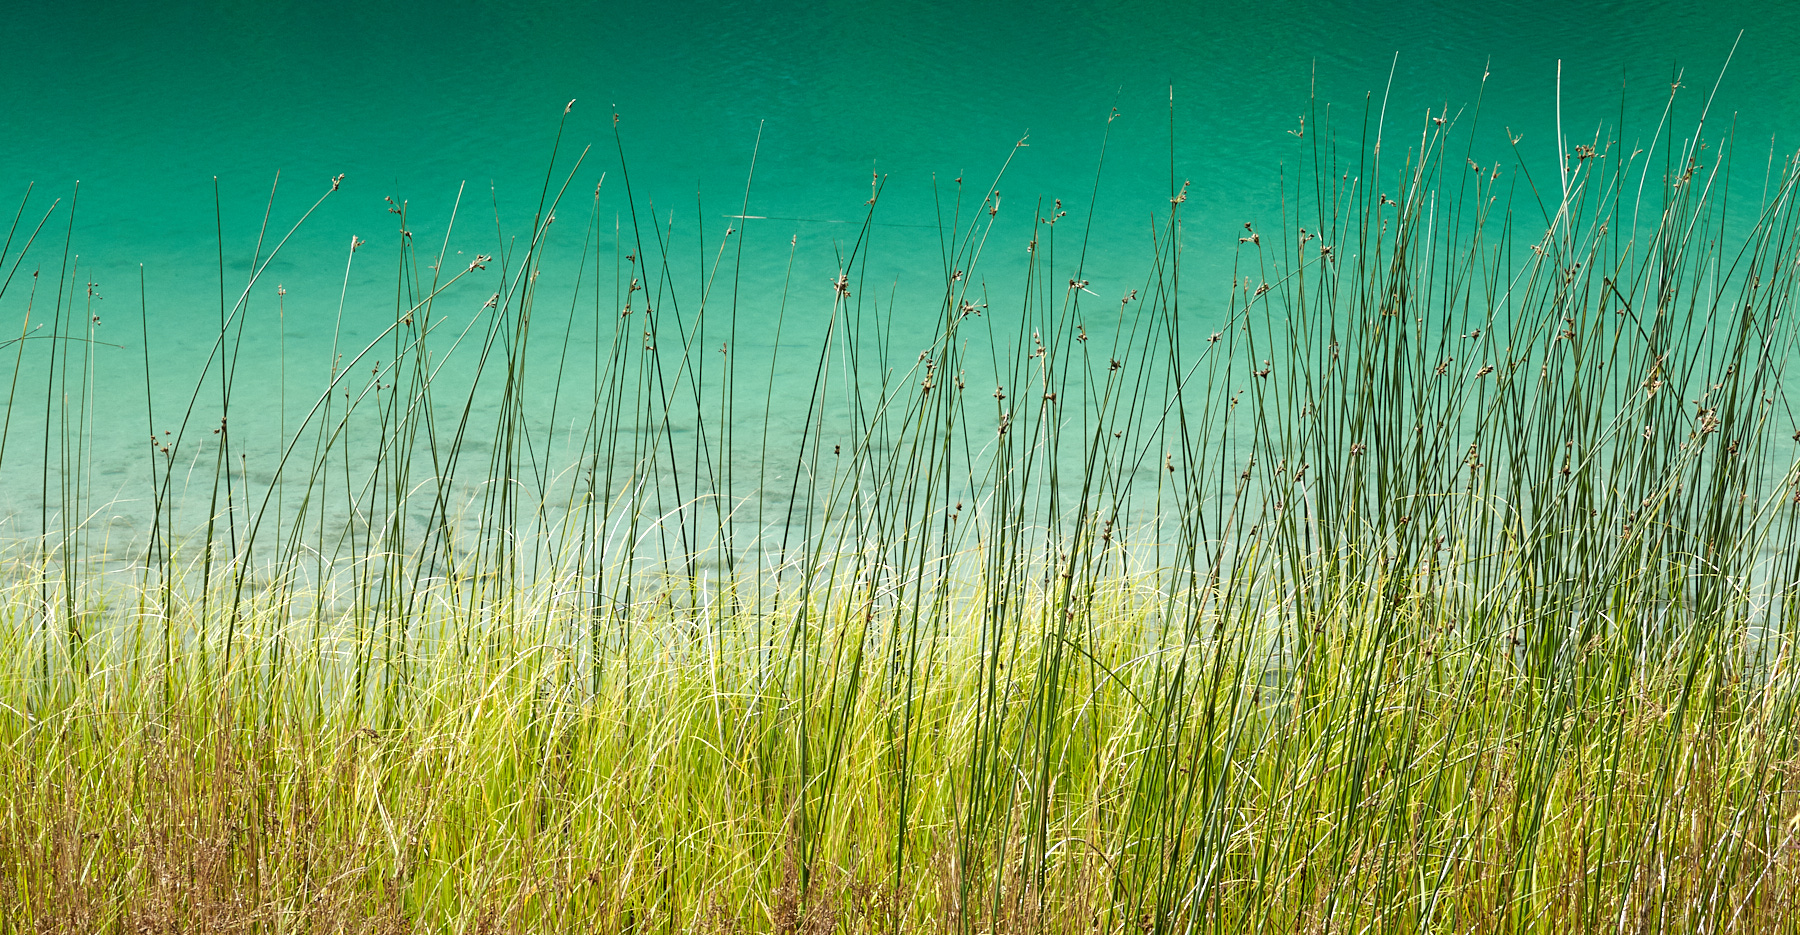 Alleyne Lake Green © johncameron.ca